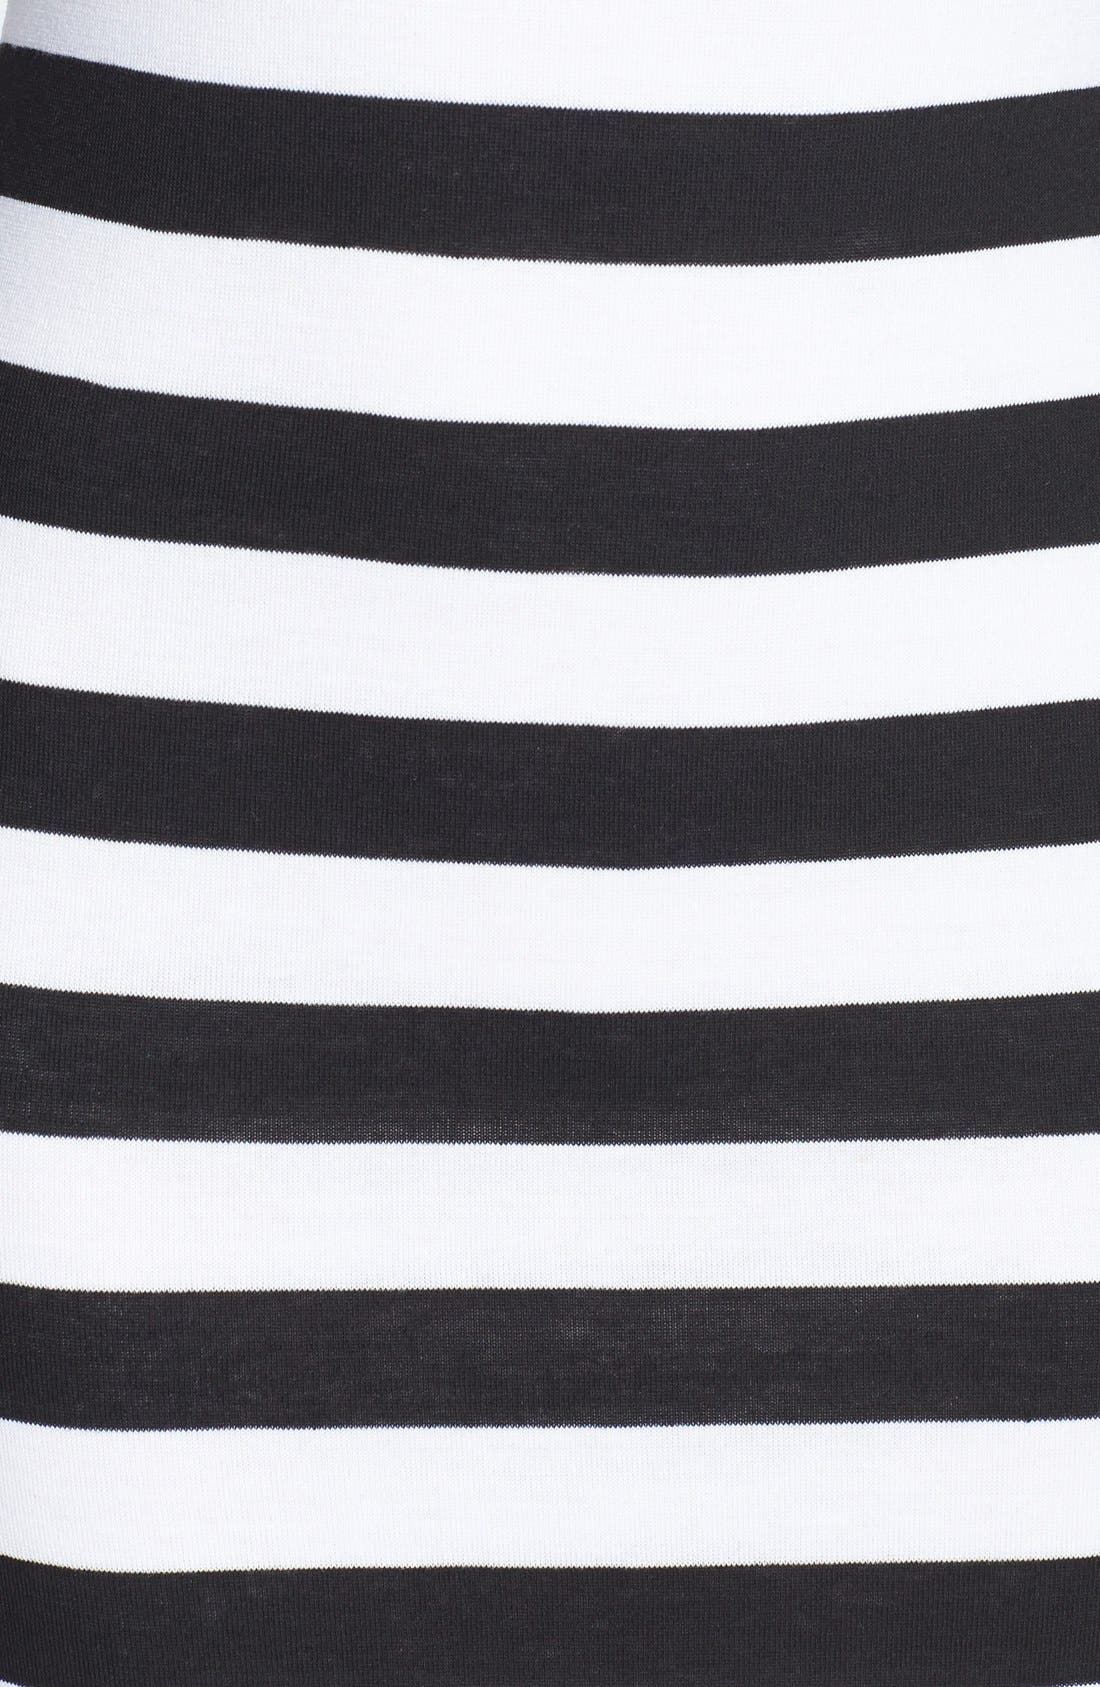 Alternate Image 3  - Minty Stripe Midi Dress (Juniors)